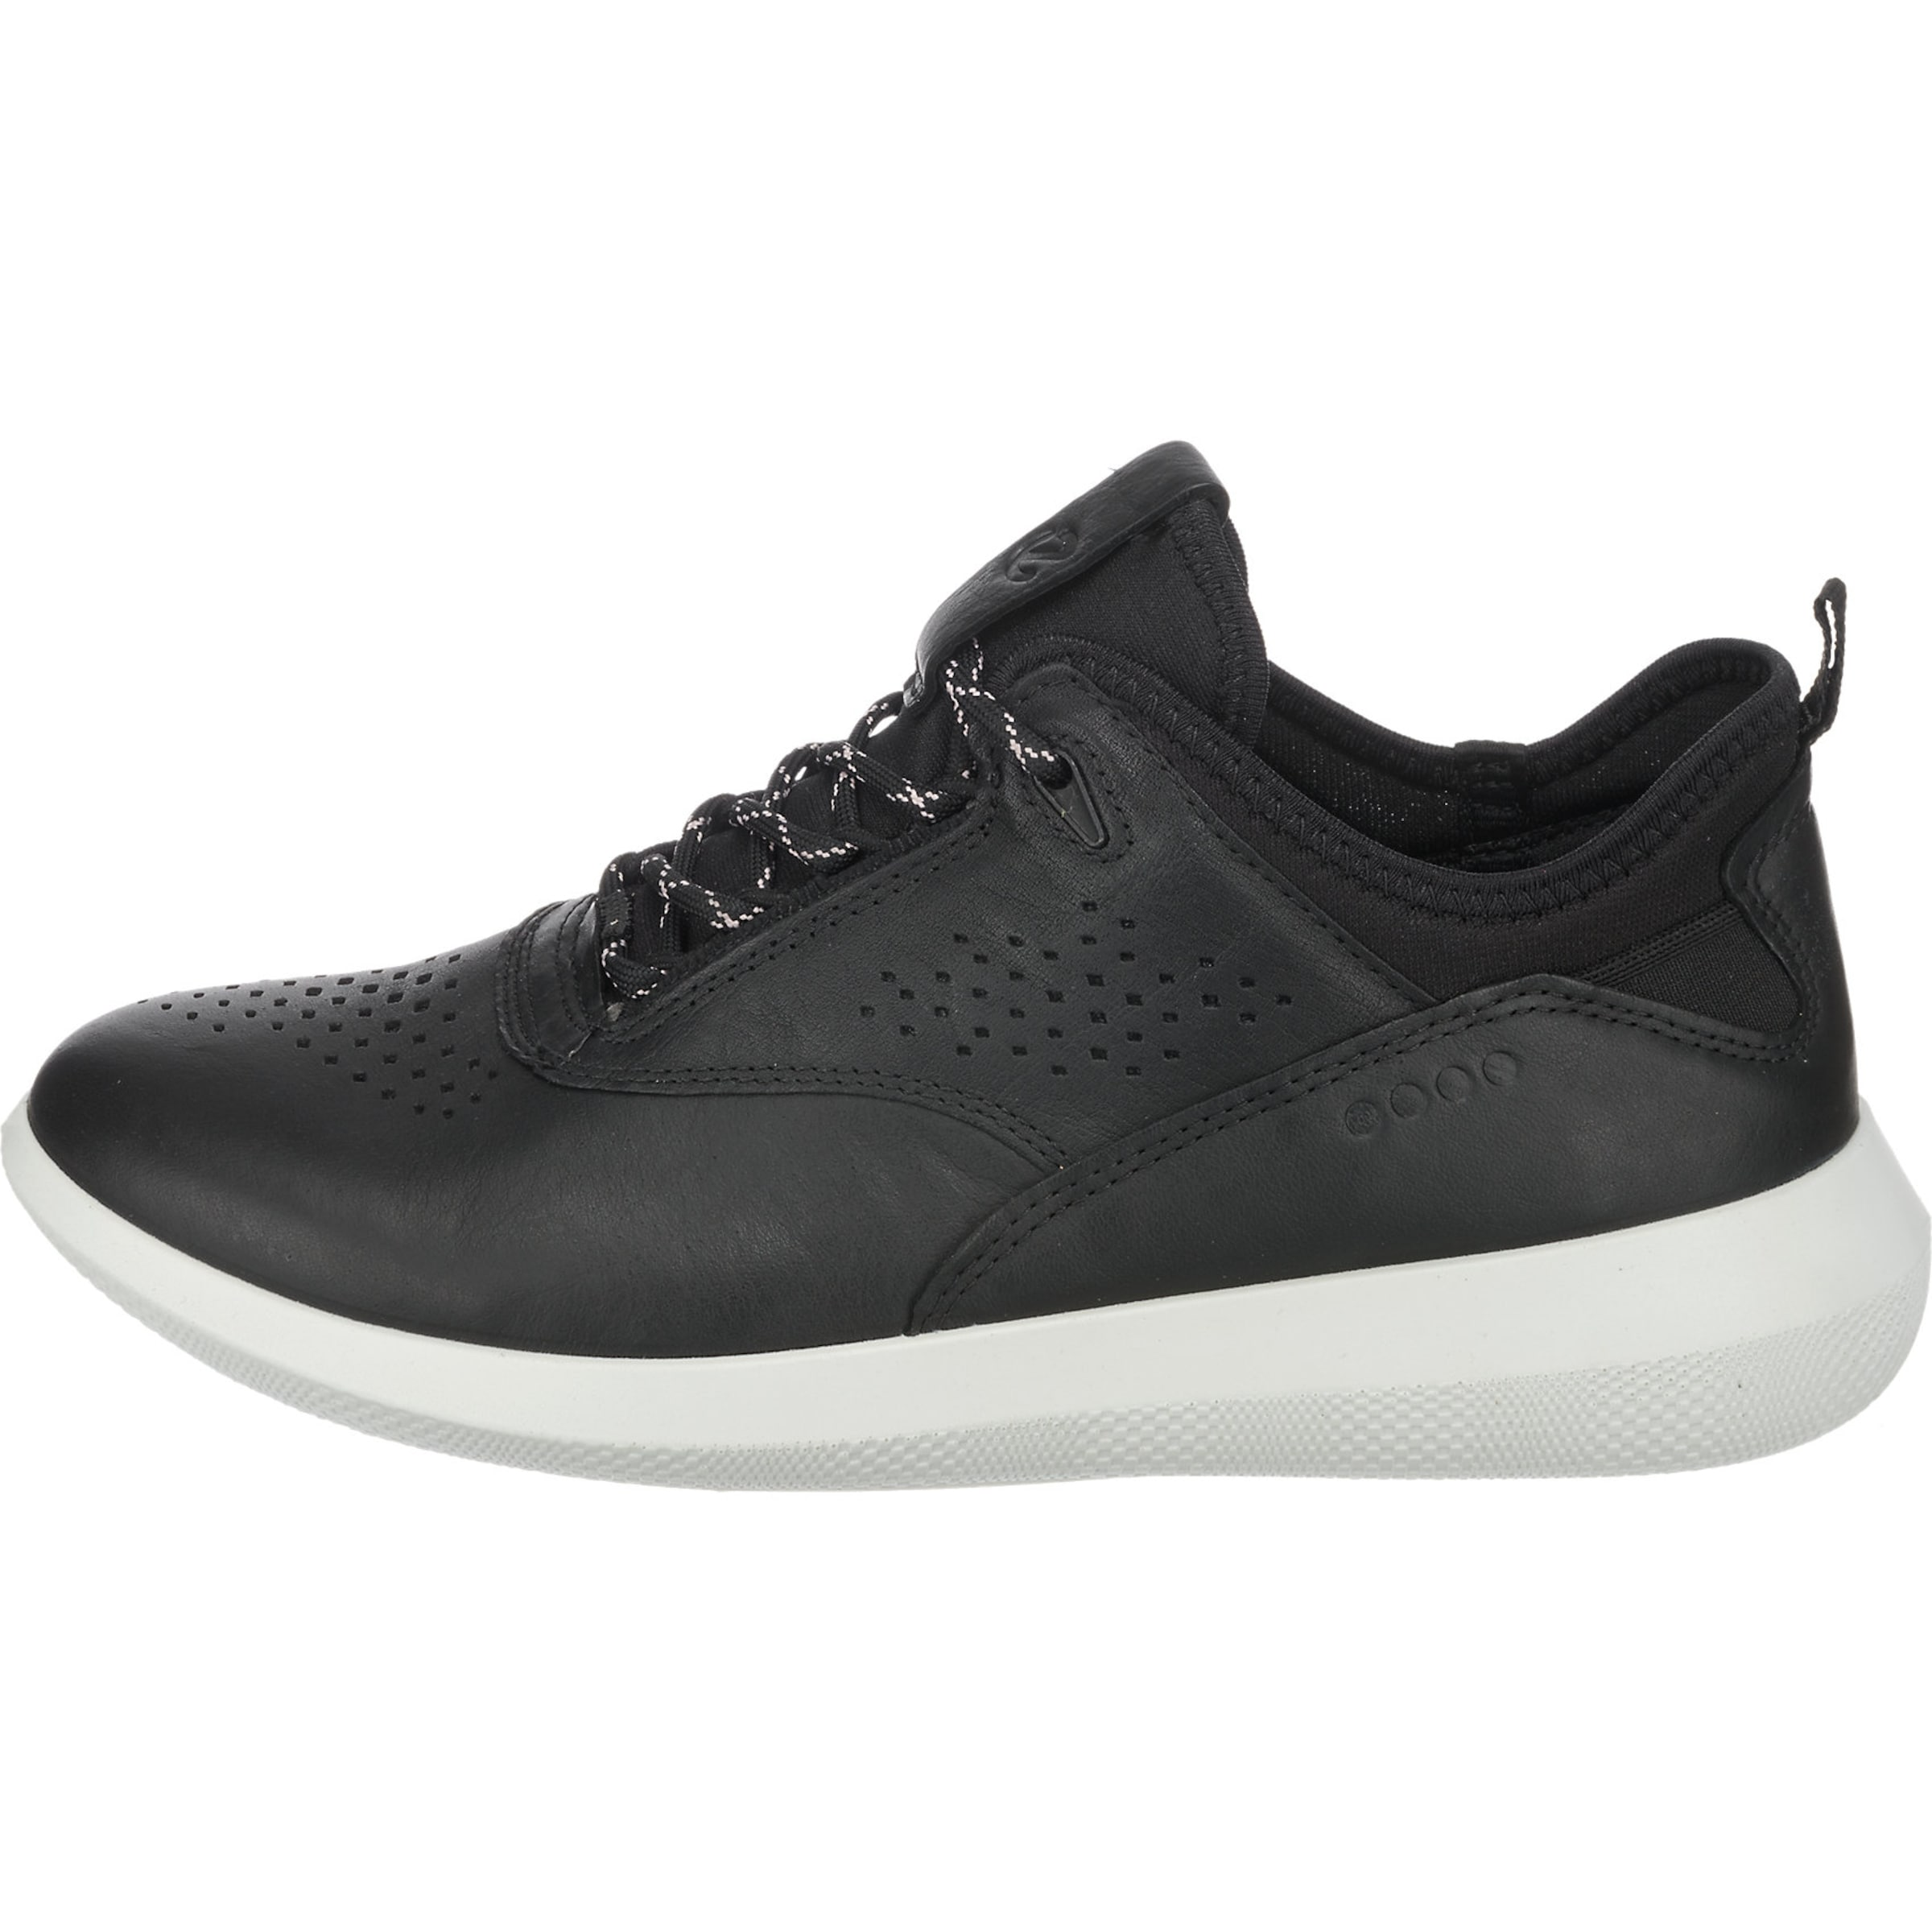 SchwarzWeiß In Ecco 7' 'soft Sneakers 0XkN8OPZnw